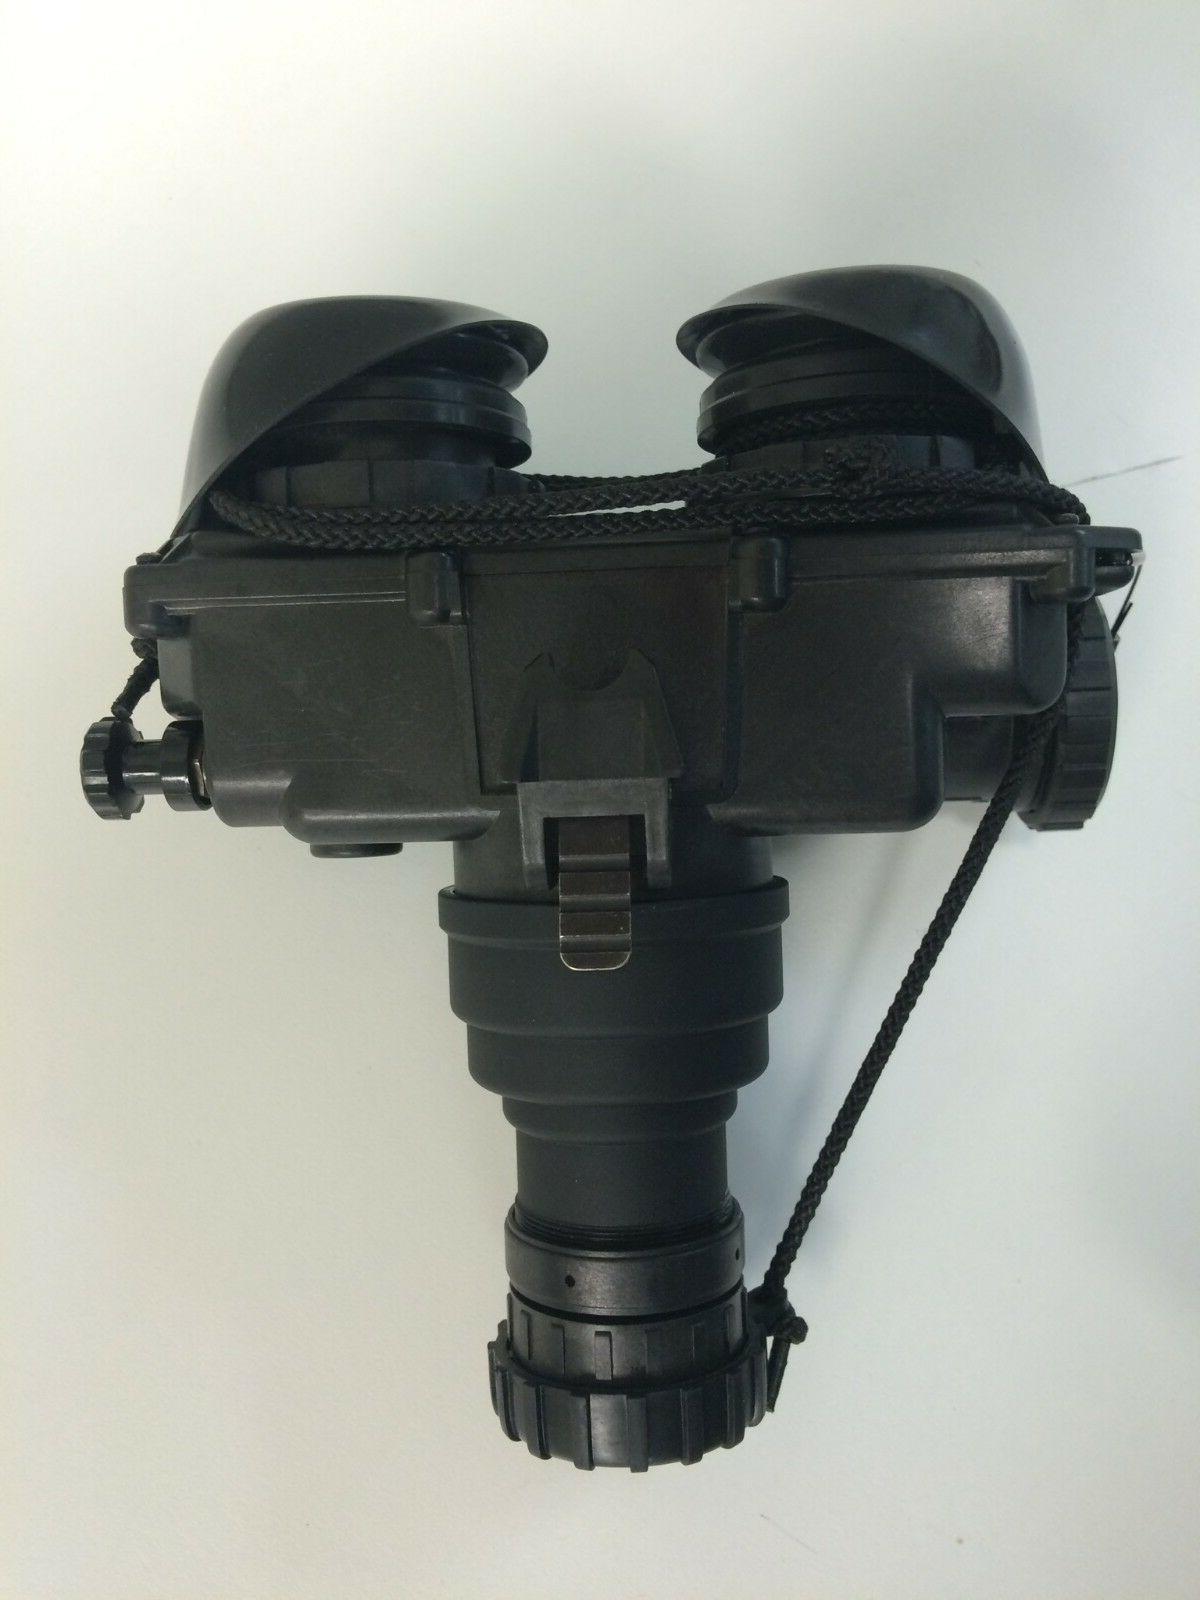 DEMO PVS-7 Night Goggle